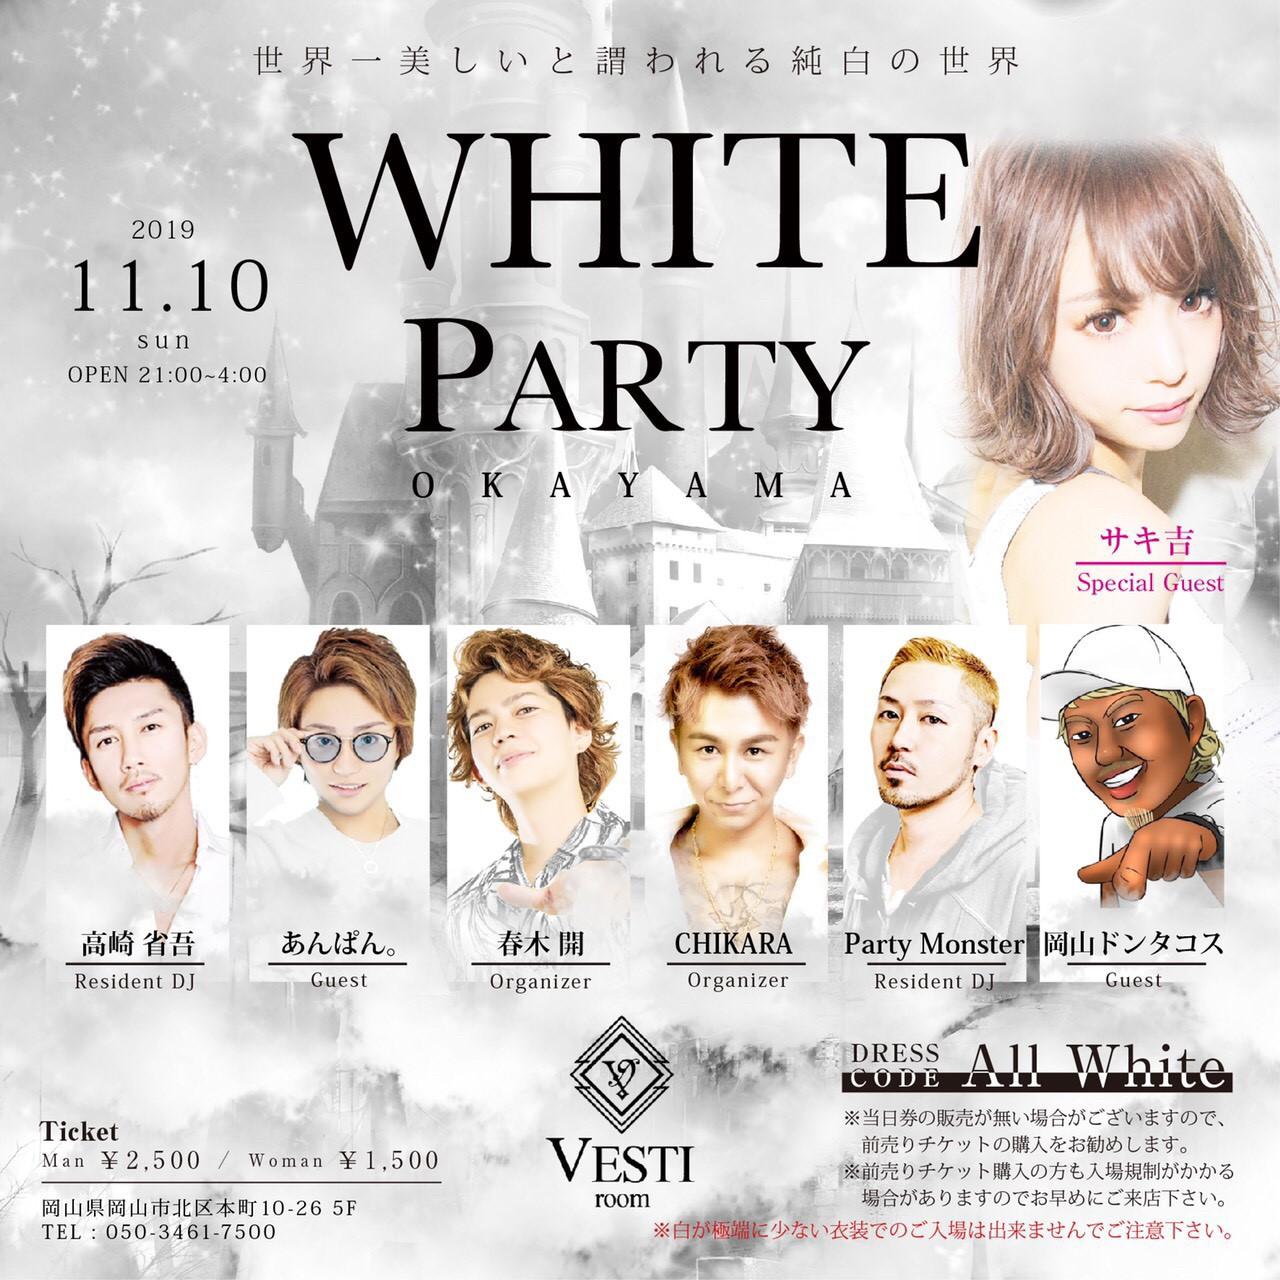 WHITE PARTY OKAYAMA